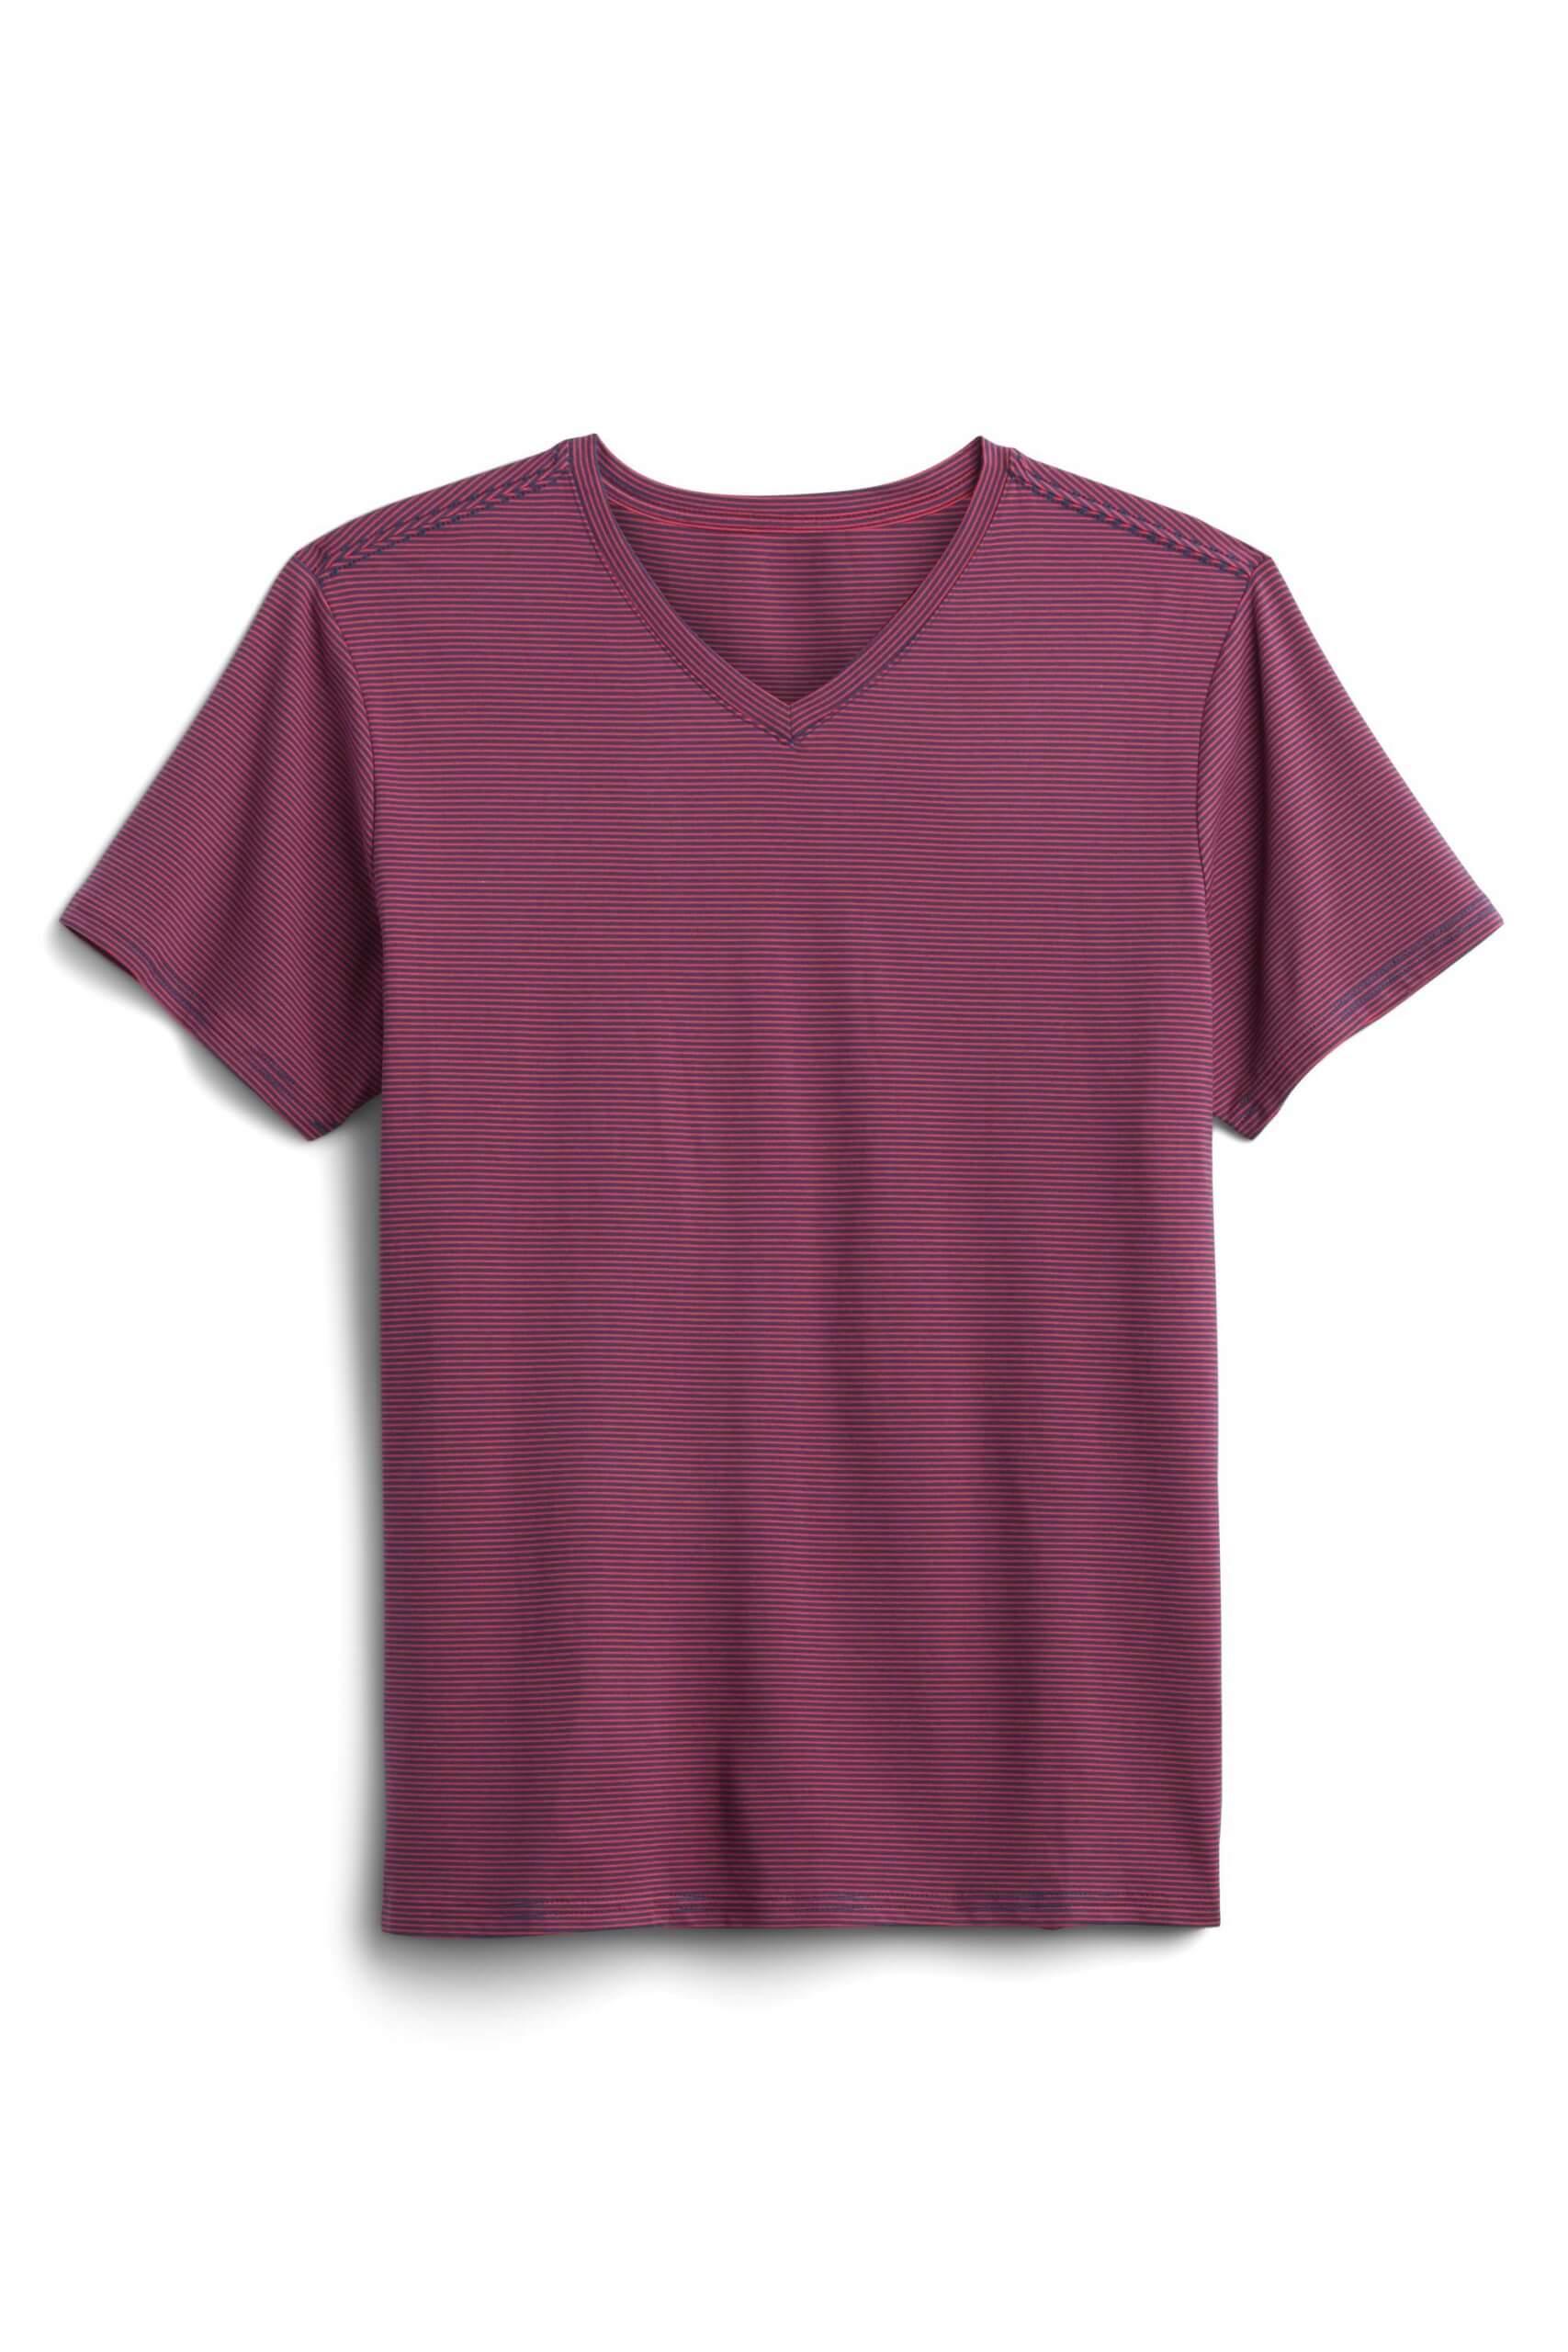 Stitch Fix Men's burgundy v-neck t-shirt.